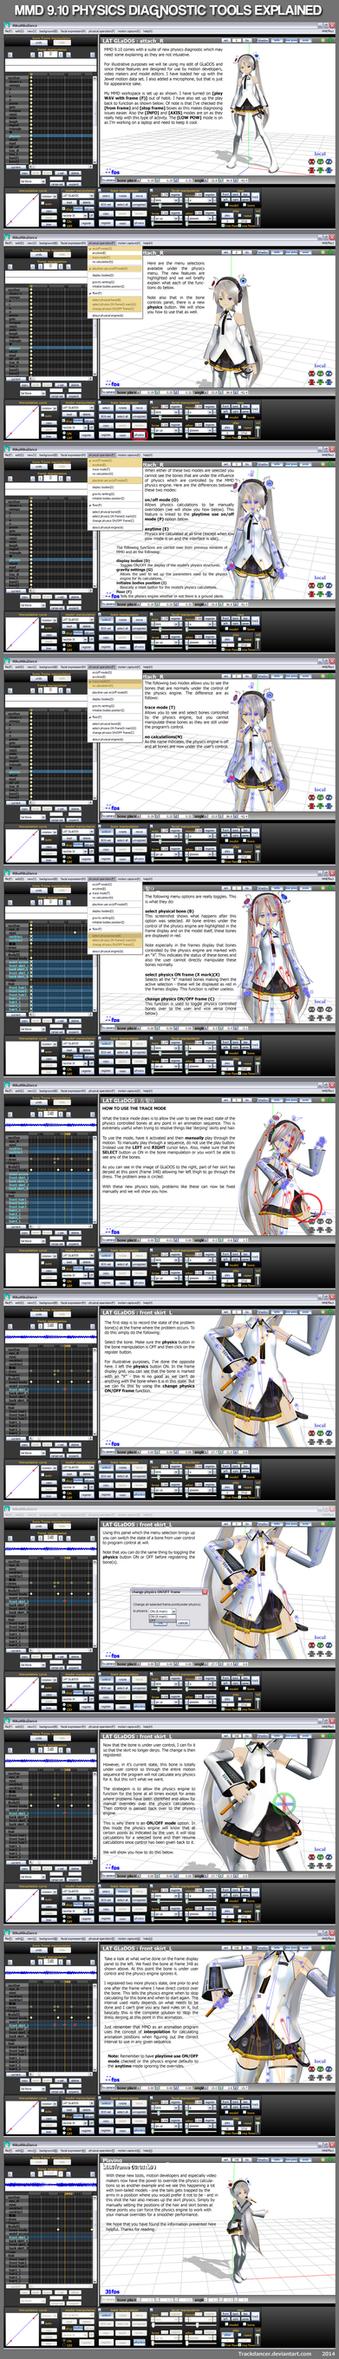 MMD Tutorial: Physics Diagnostics Tools by Trackdancer